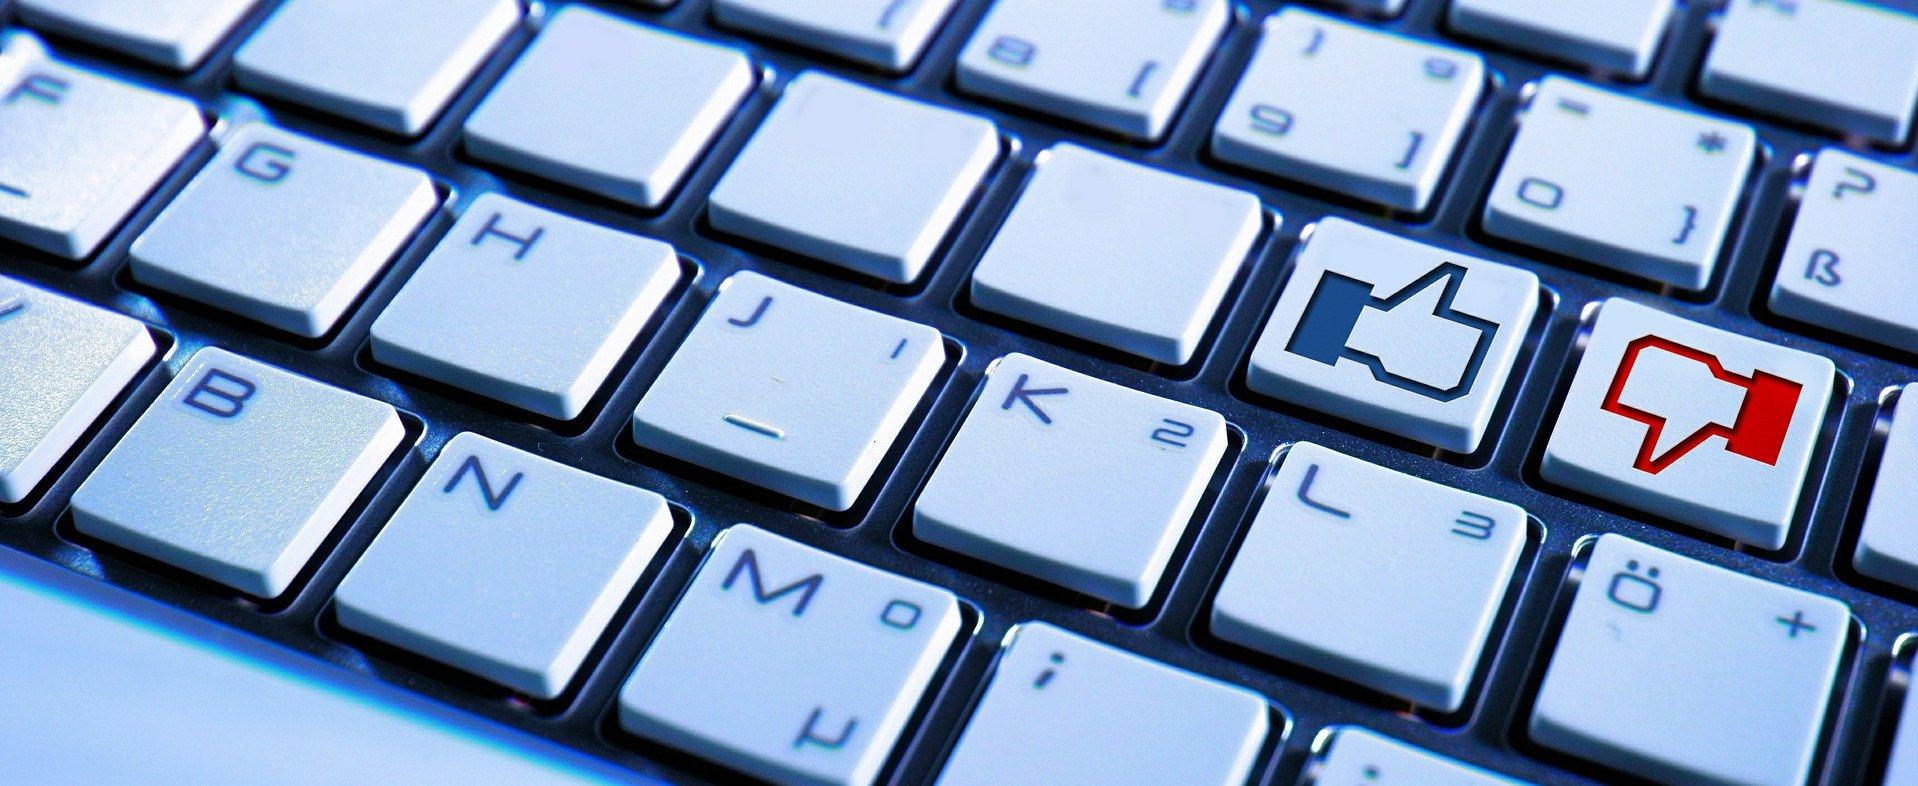 Tastatur mit Facebook-Daumen